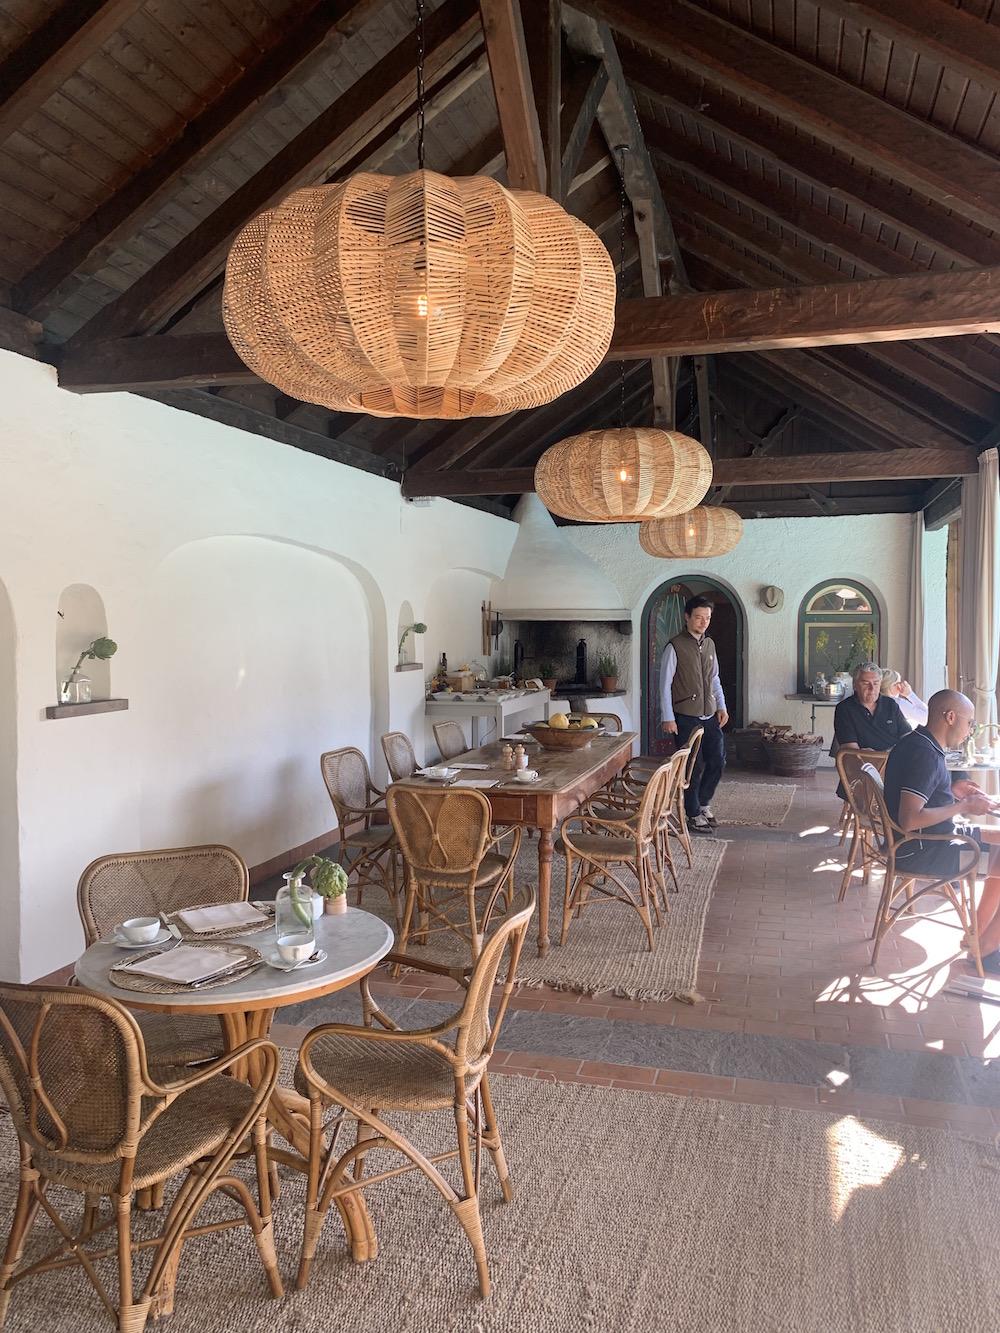 Frühstück in der Villa Arnica Modepilot South tyrol